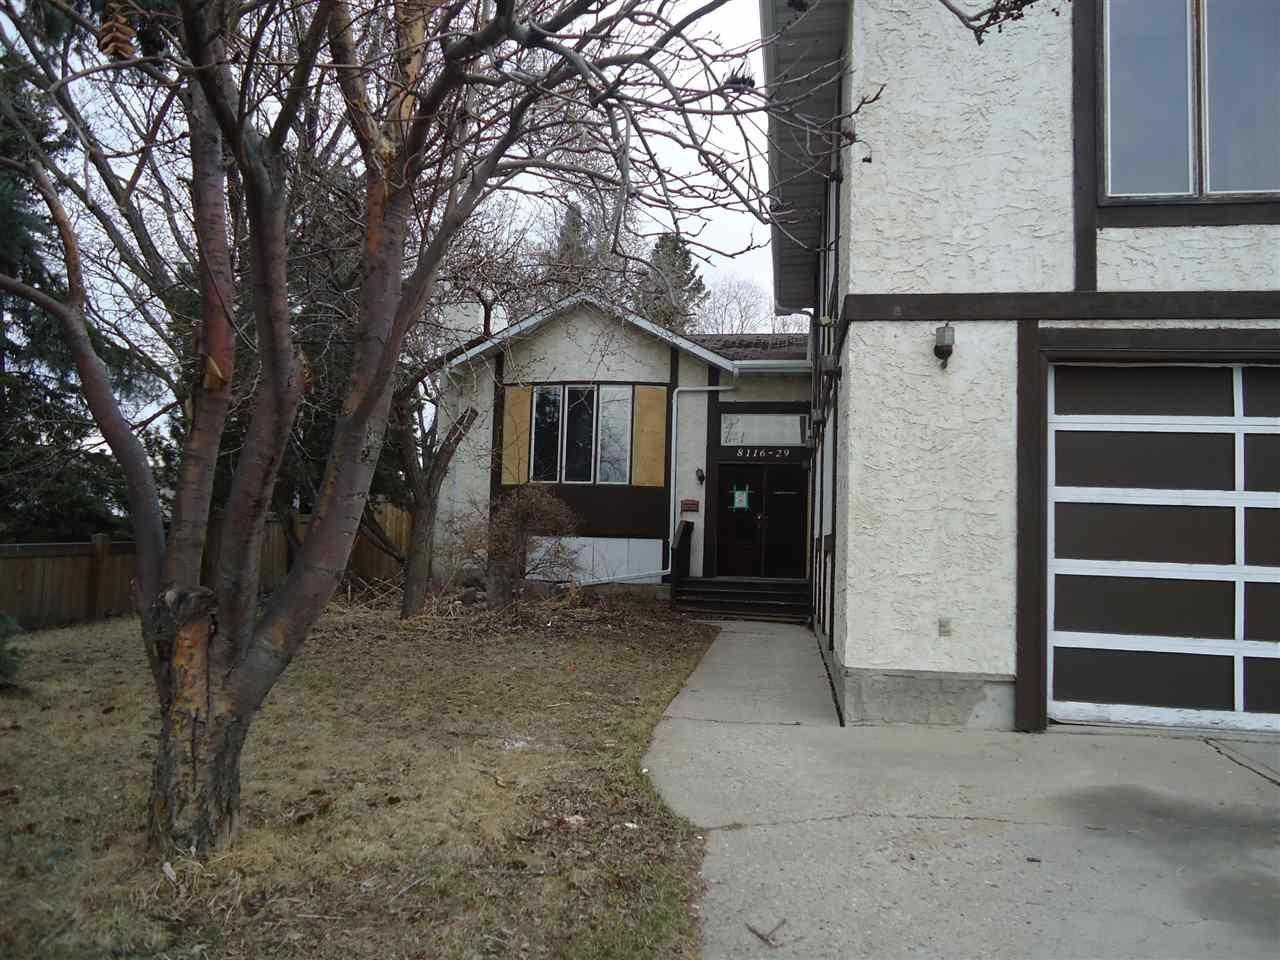 Main Photo: 8116 29 Avenue in Edmonton: Zone 29 House for sale : MLS®# E4241573